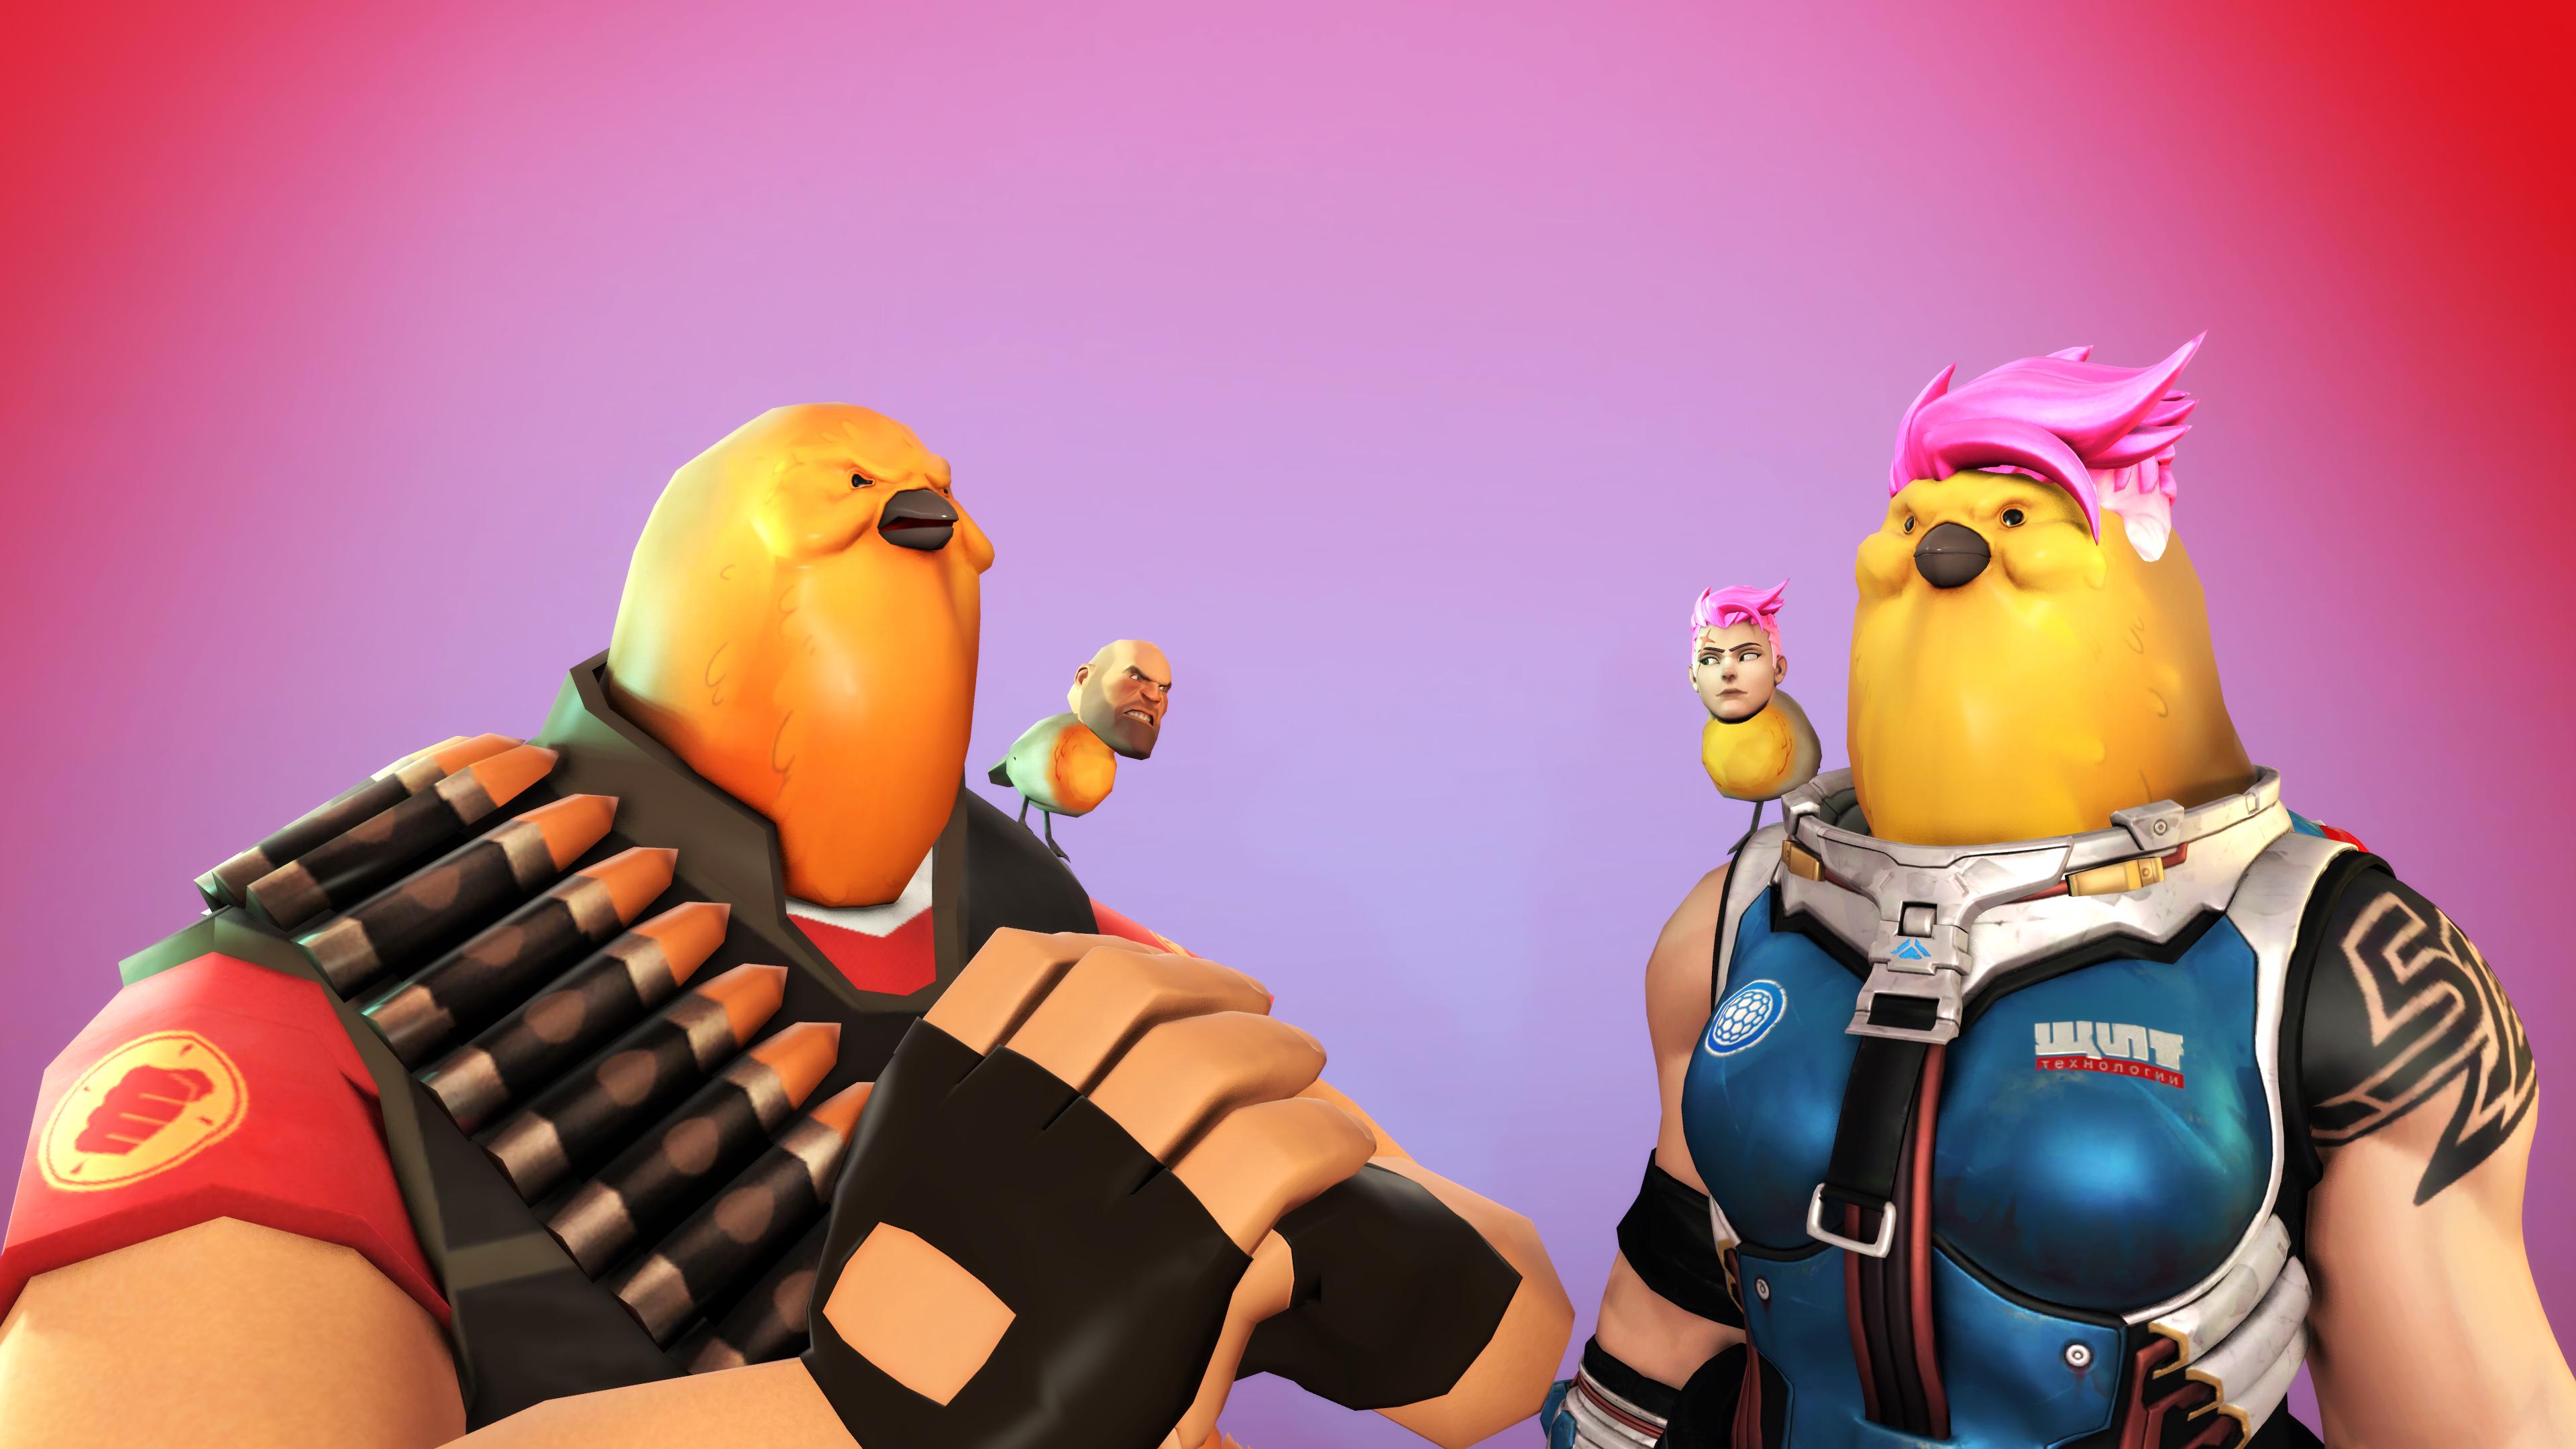 Hoovy Bird Overwatch Know Your Meme